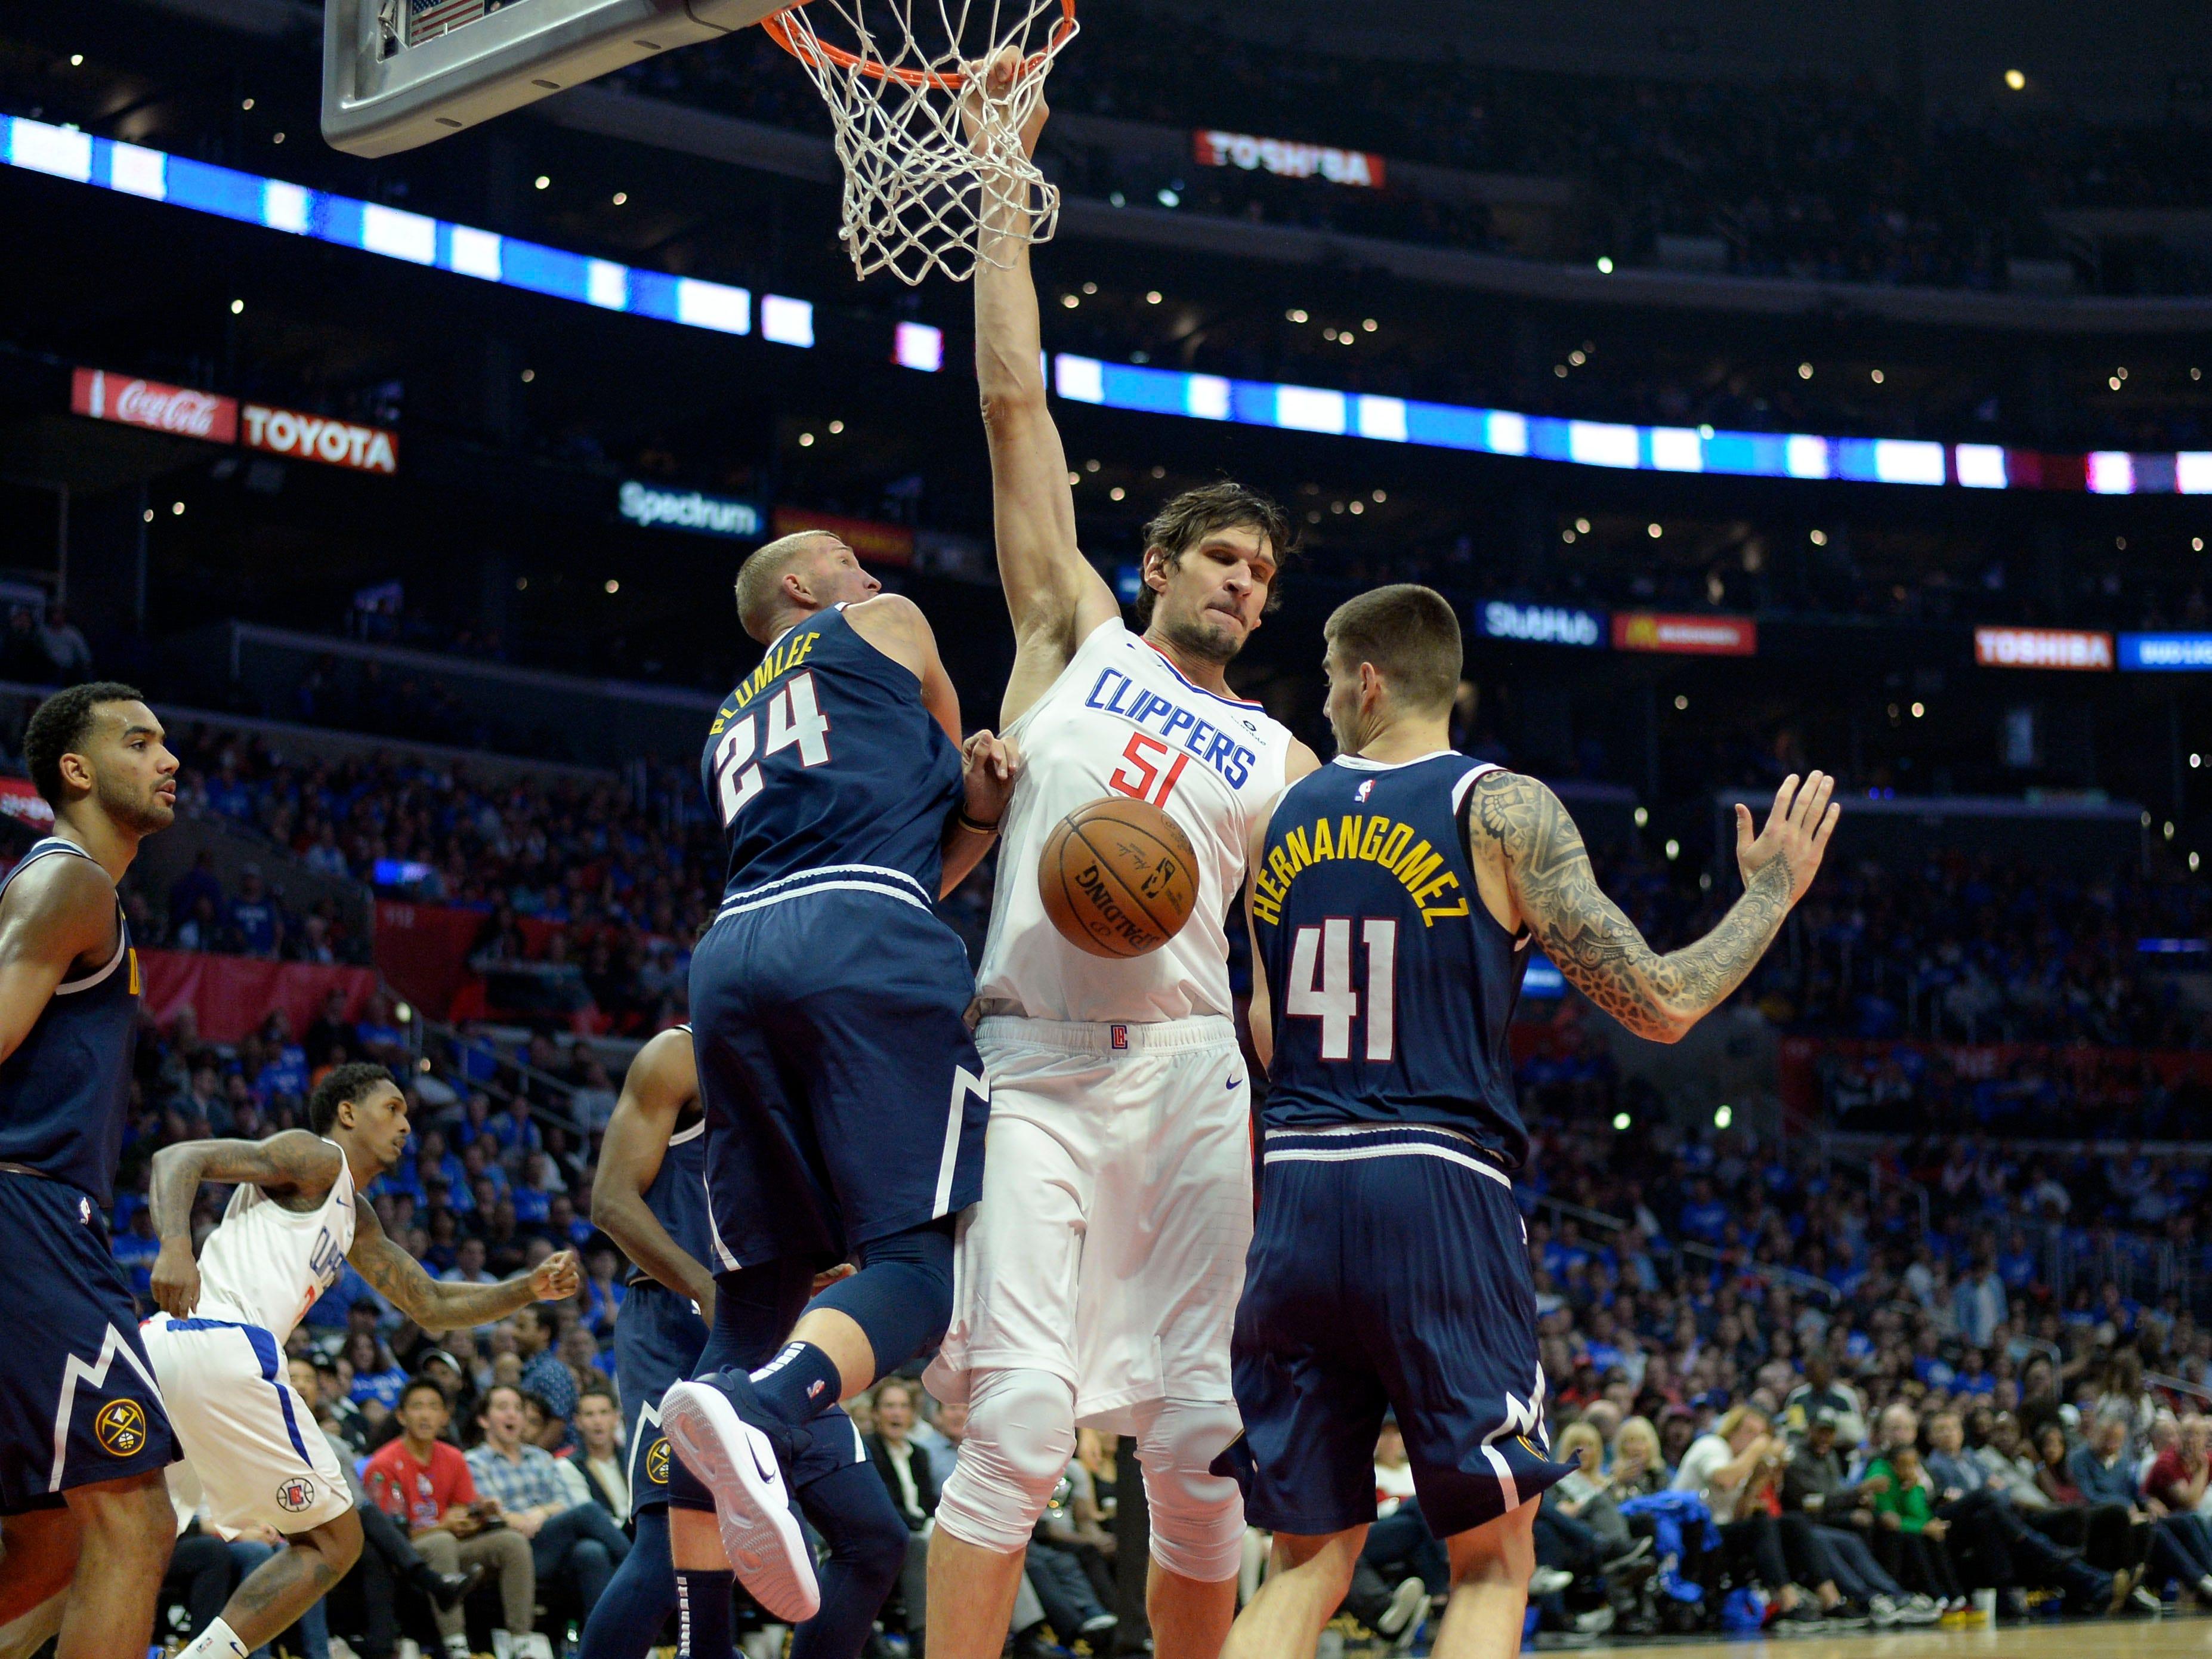 Oct. 17: LA Clippers center Boban Marjanovic dunks over Denver Nuggets forward Mason Plumlee and forward Juan Hernangomez during the fourth quarter at Staples Center.